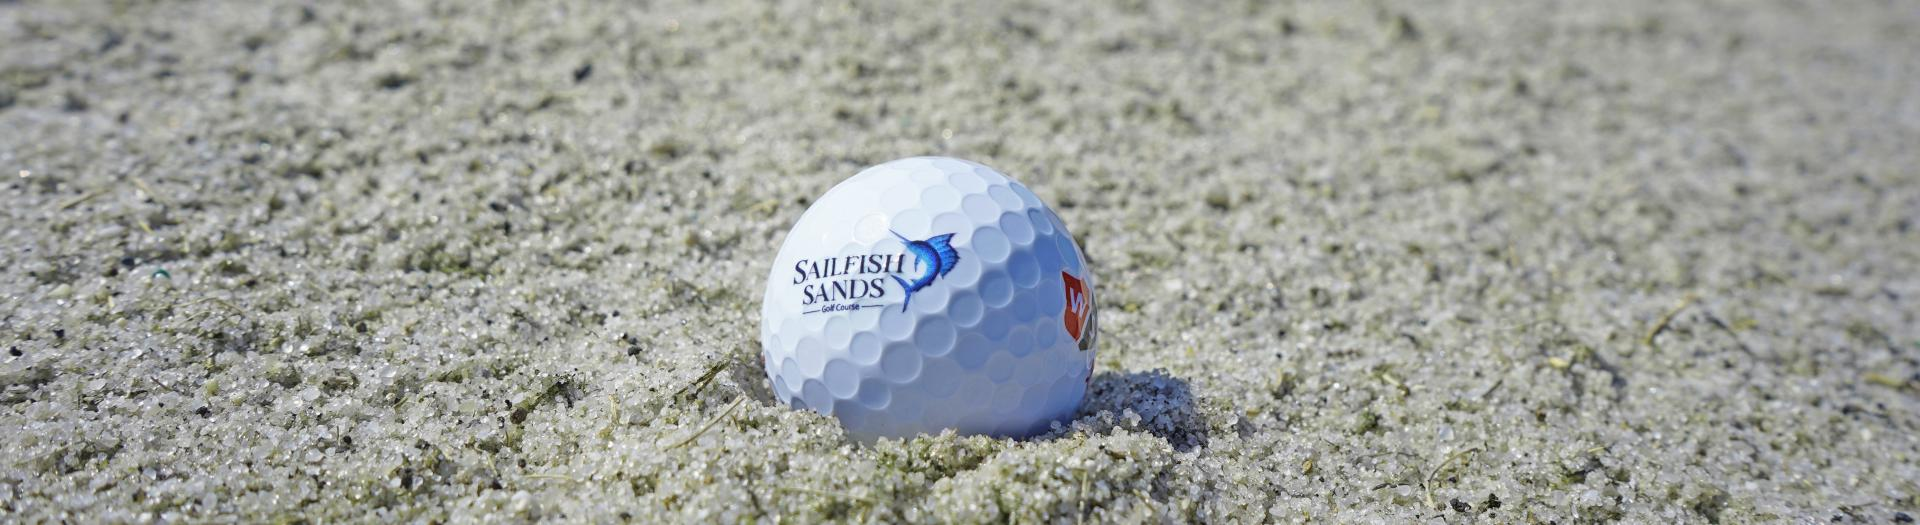 Sailfish Sands golf ball